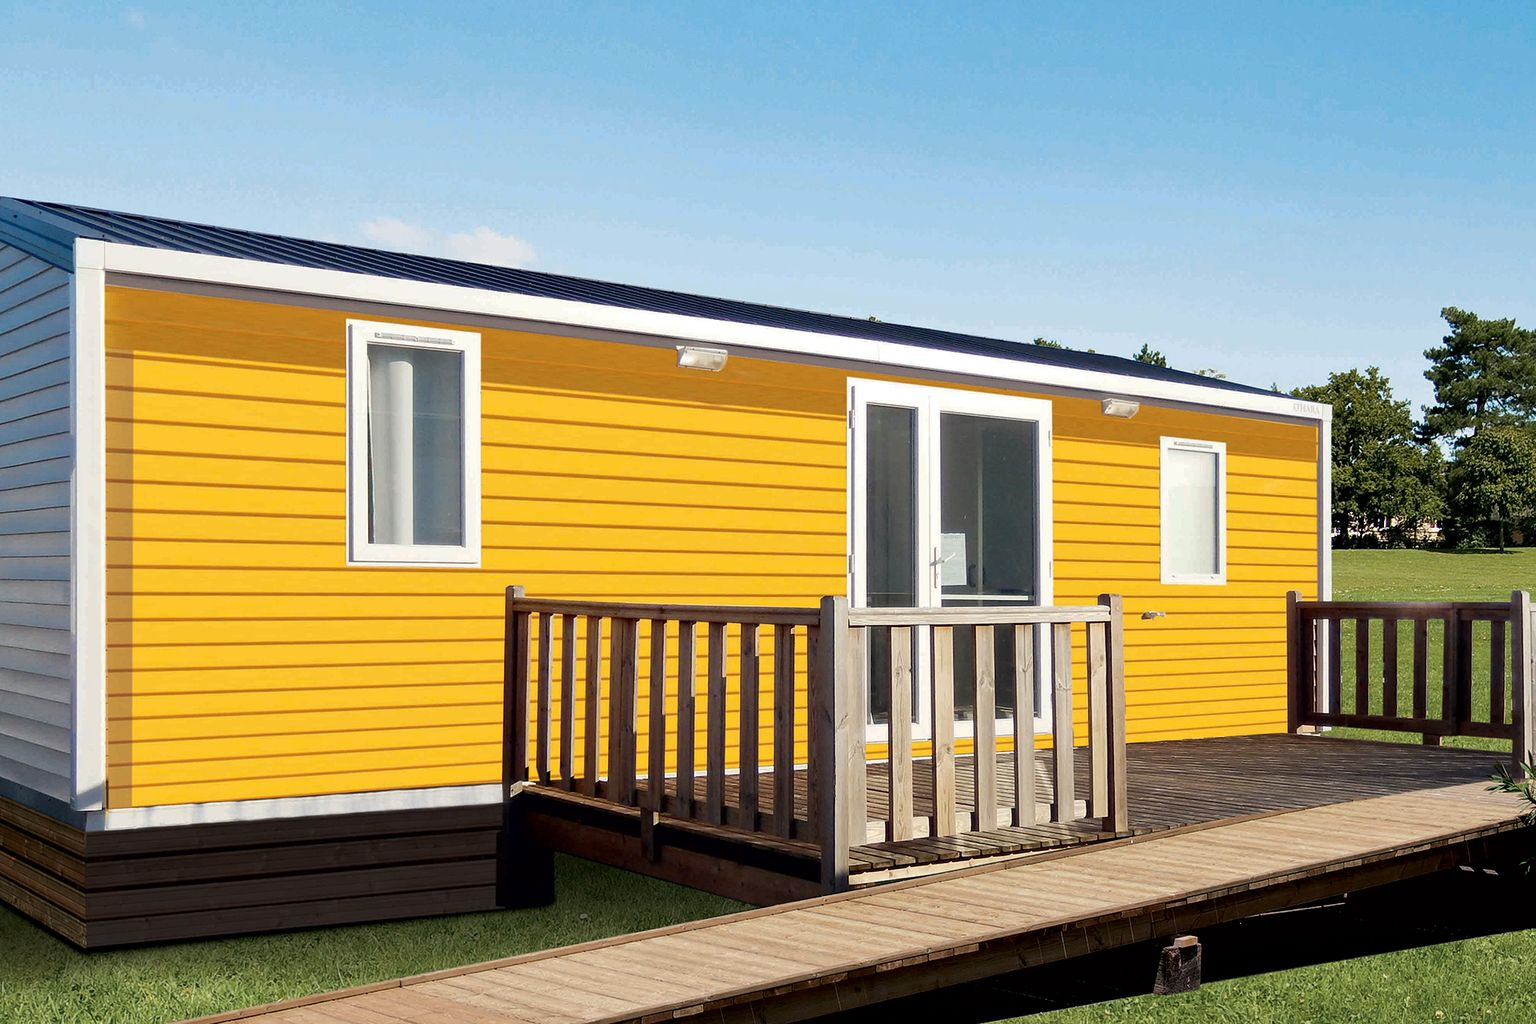 Location - Cottage Pmr 2 Chambres *** - Camping Sandaya L'Orée du Bois